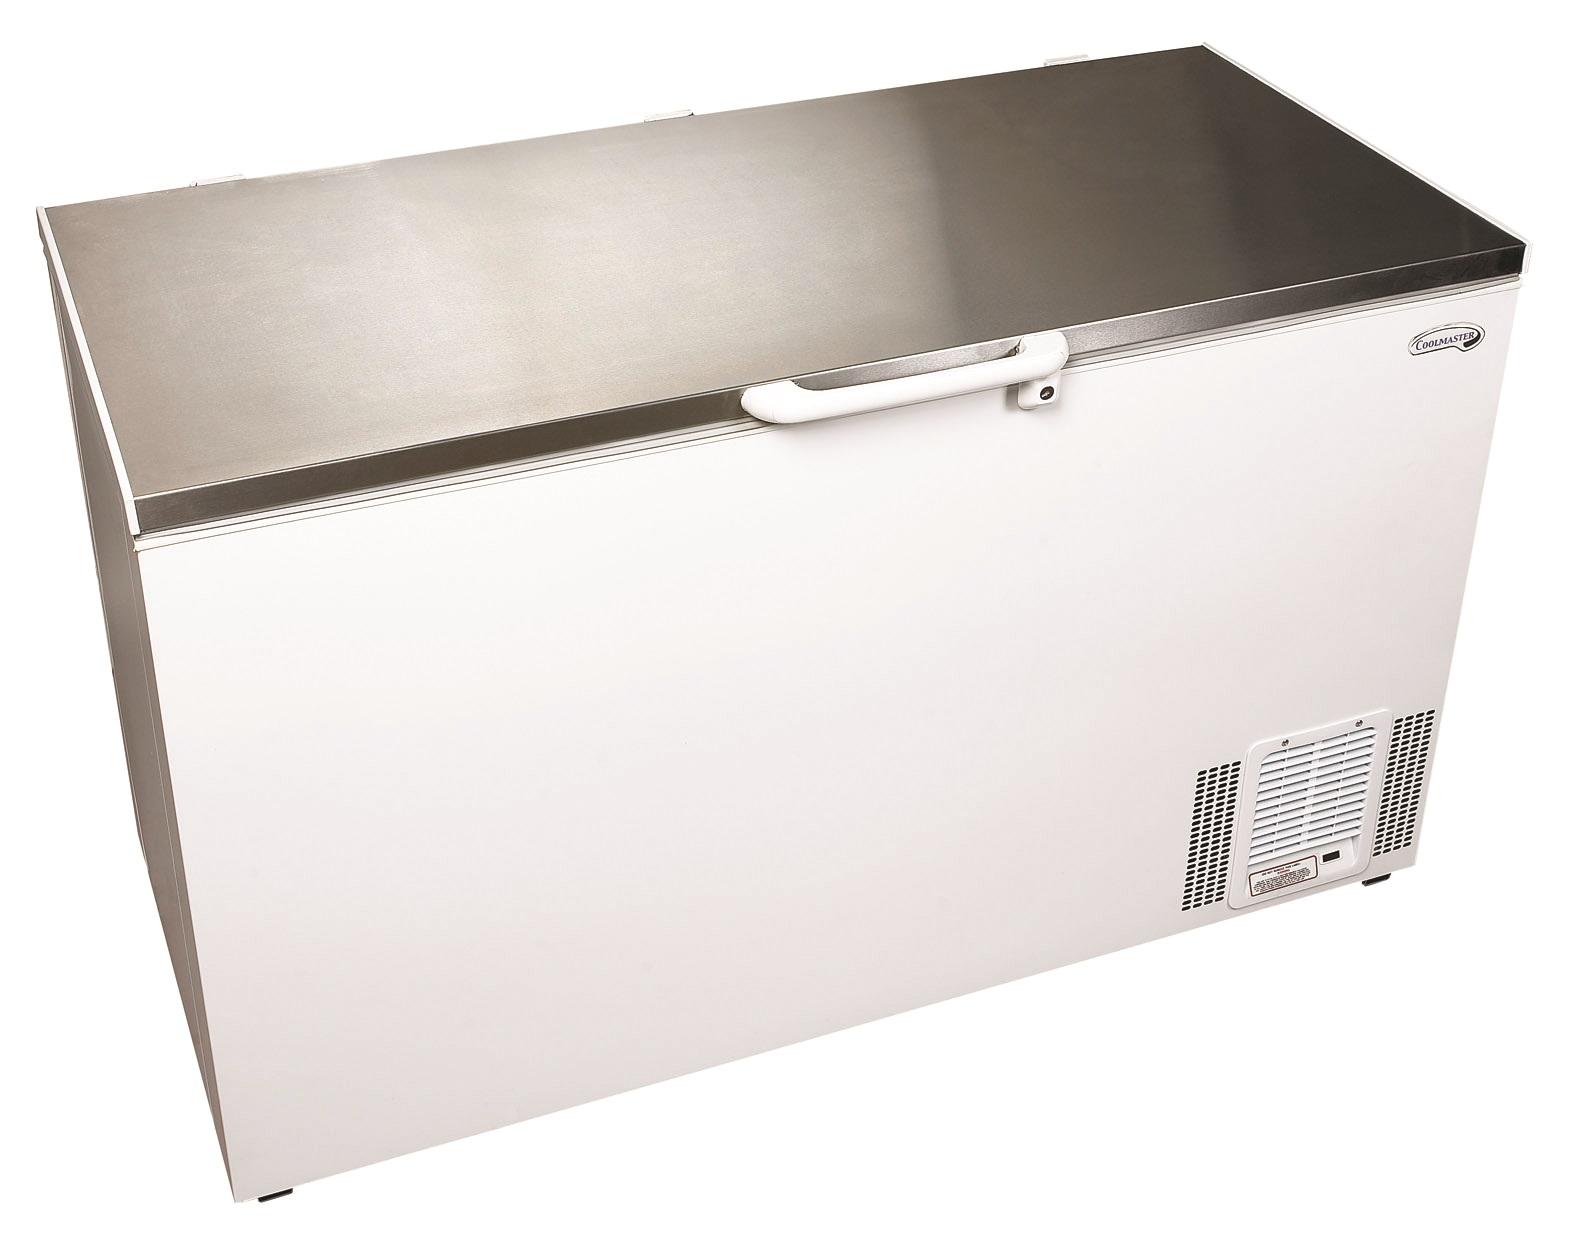 Fridge Star 520lt Commercial S S Lid Chest Freezer Direct